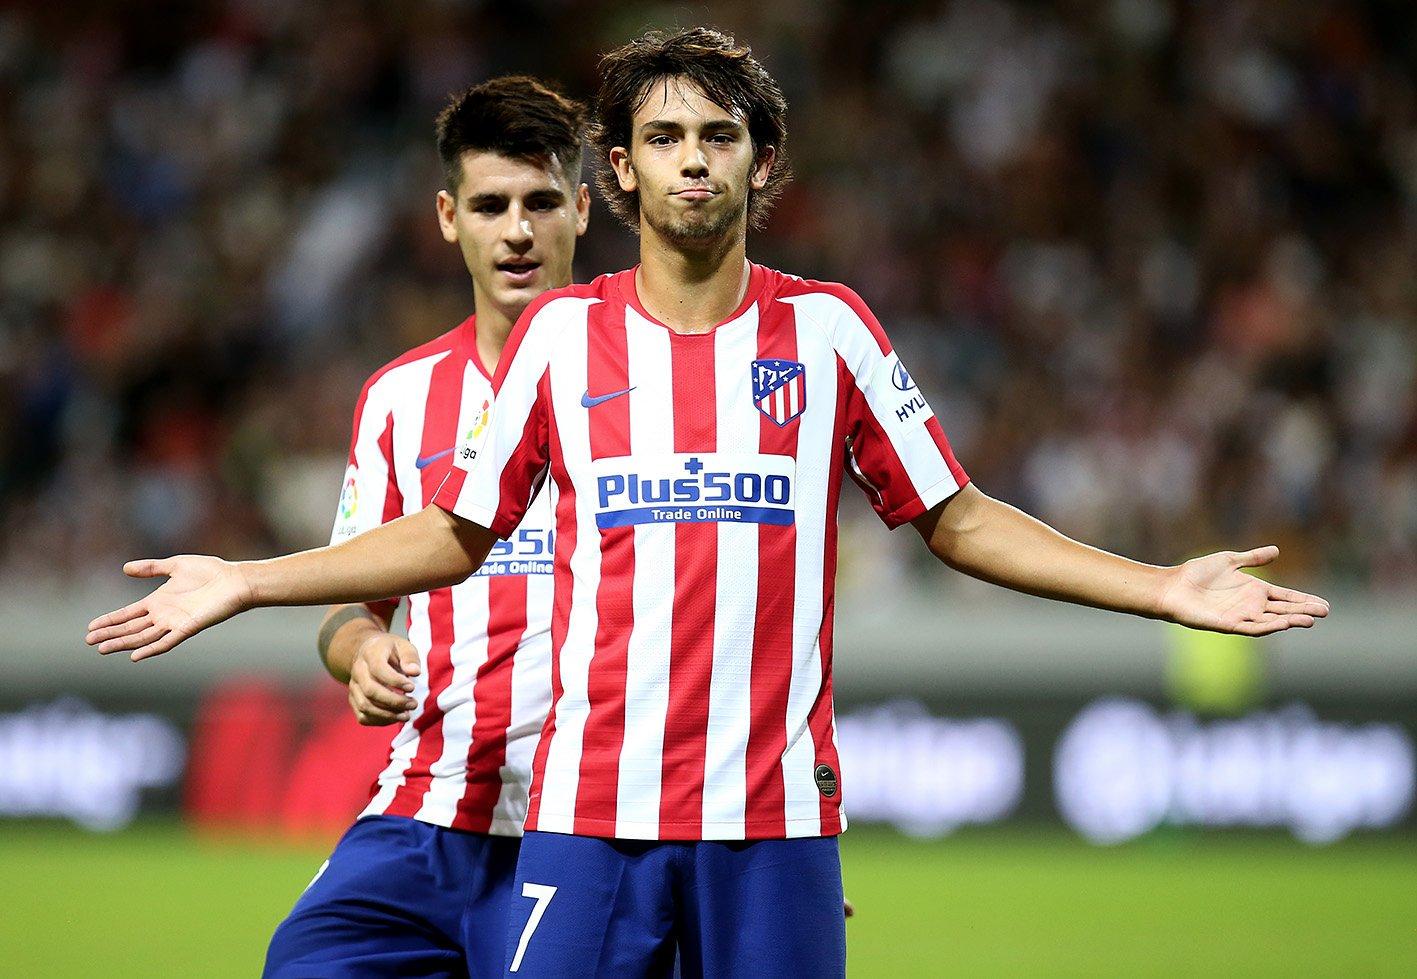 La Liga: Atletico Madrid vs Getafe Preview